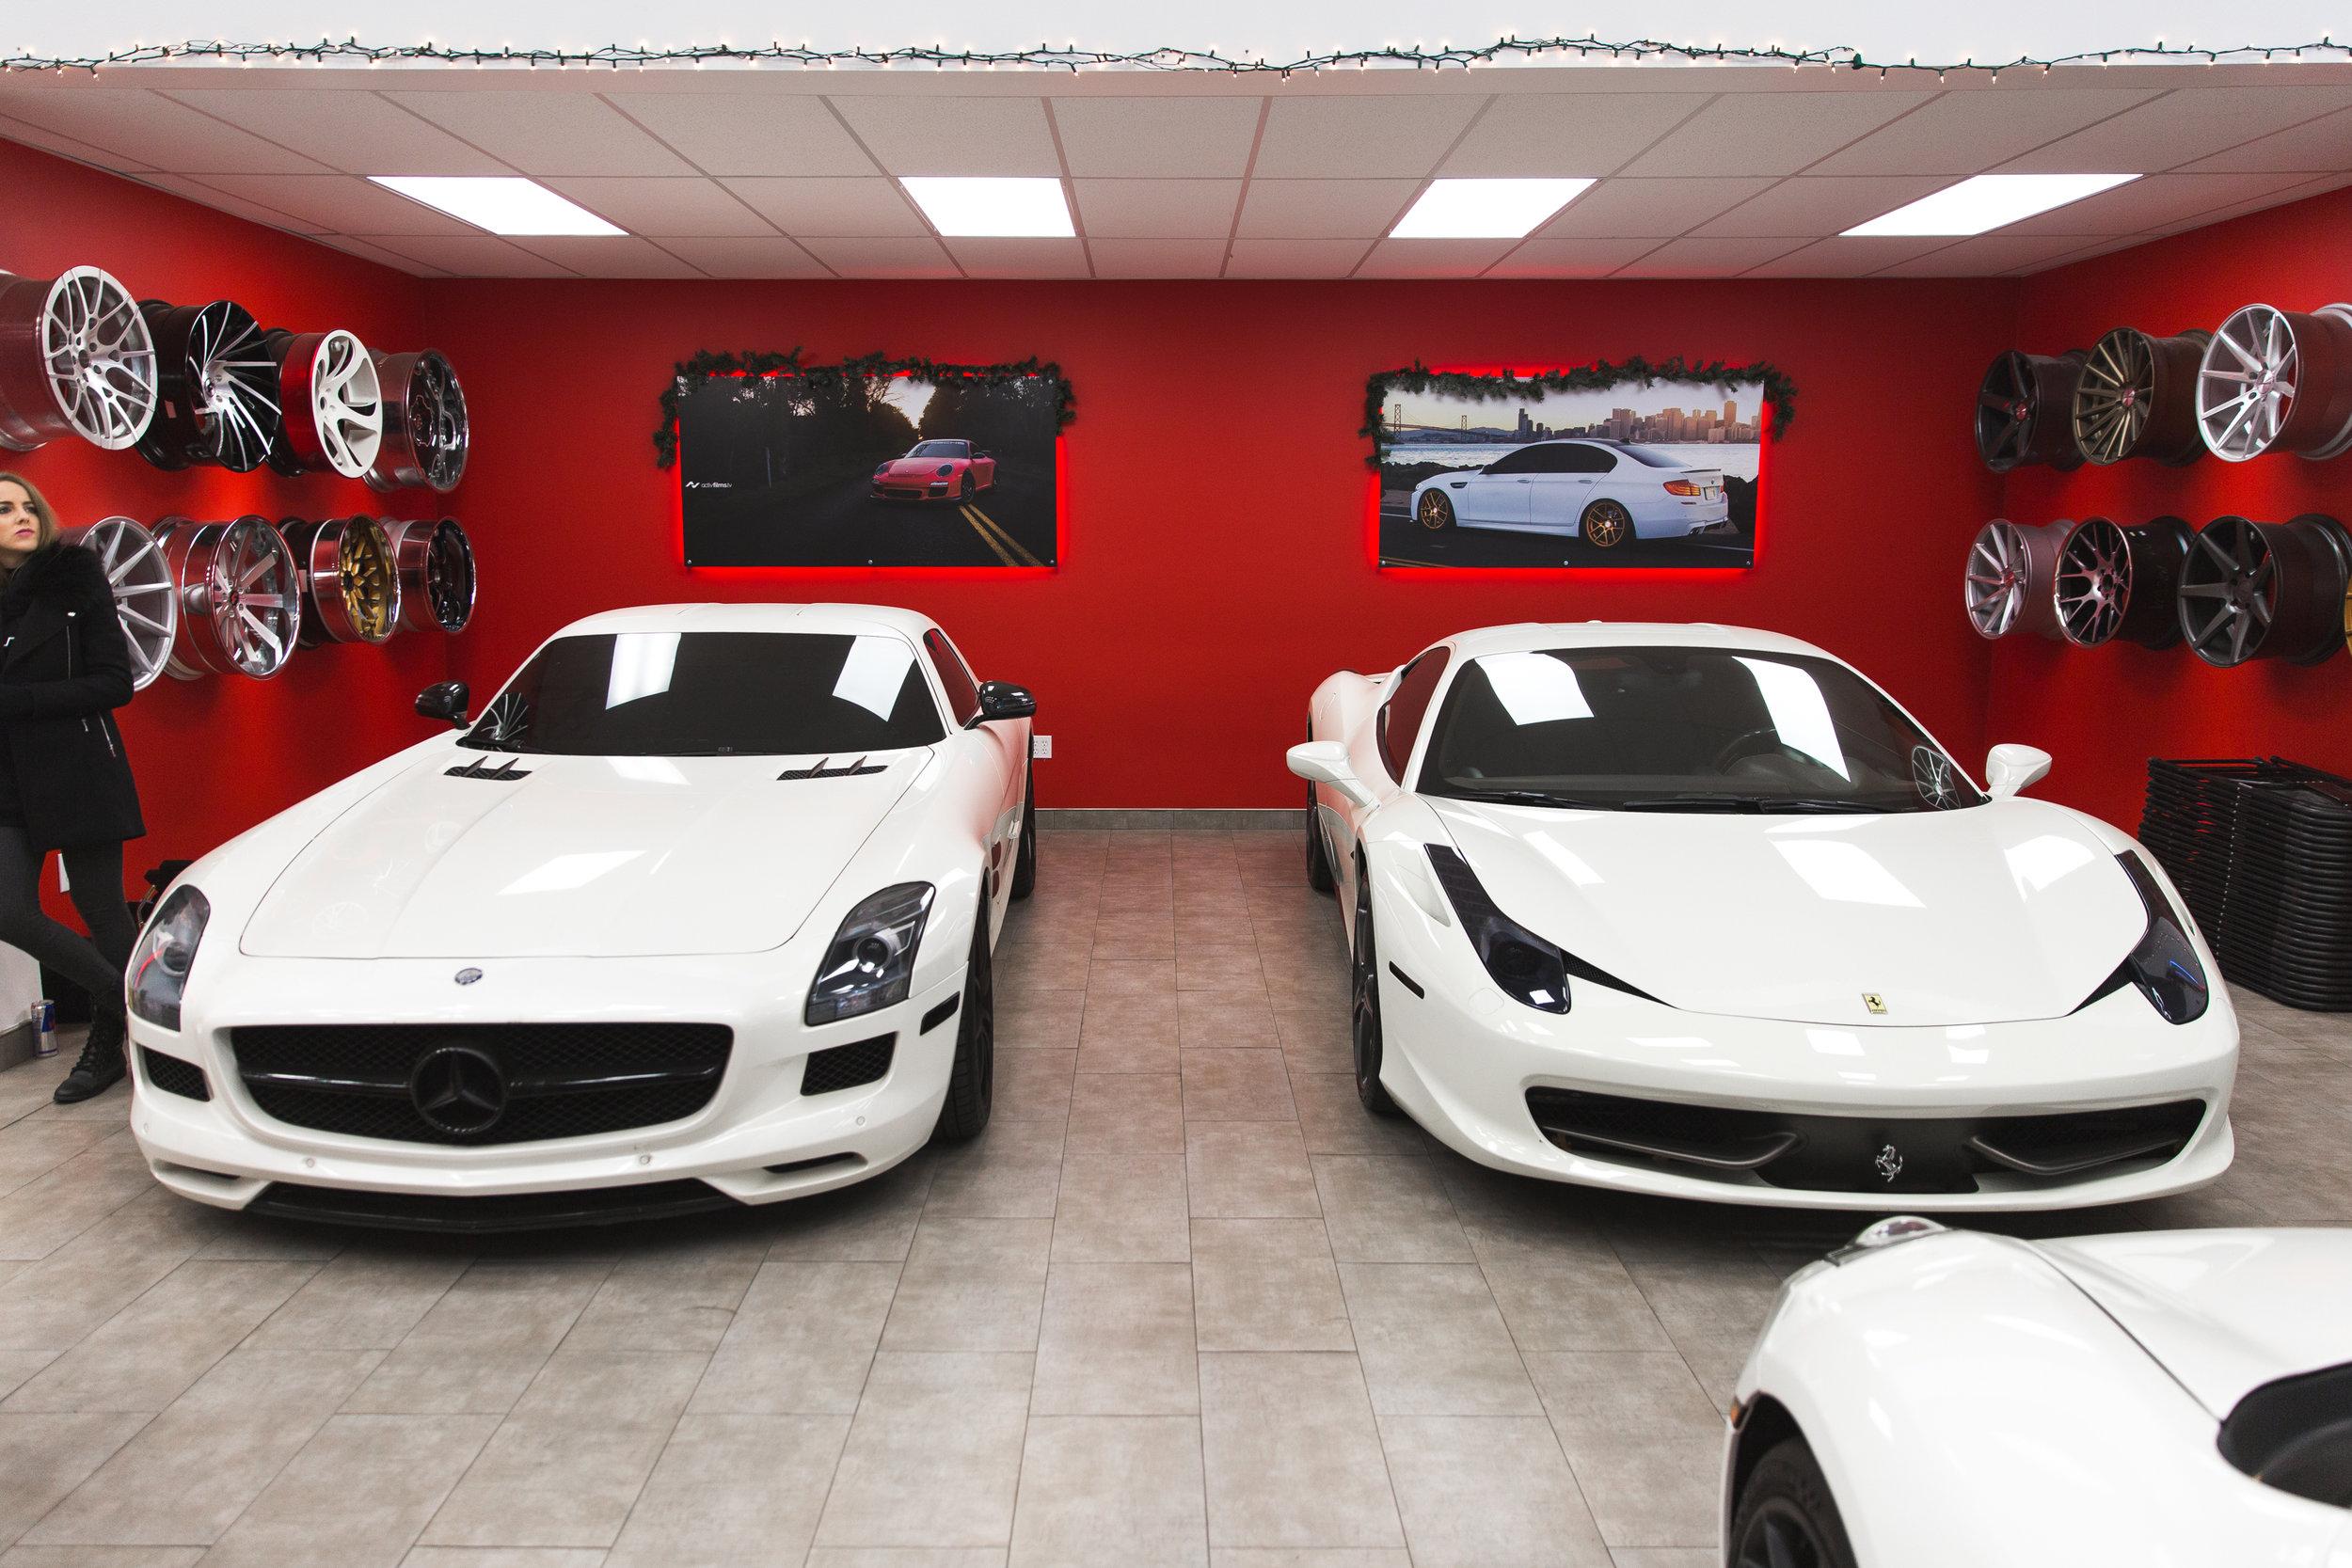 Stay_Driven_Sacramento_Diamond_Autosport-11.jpg